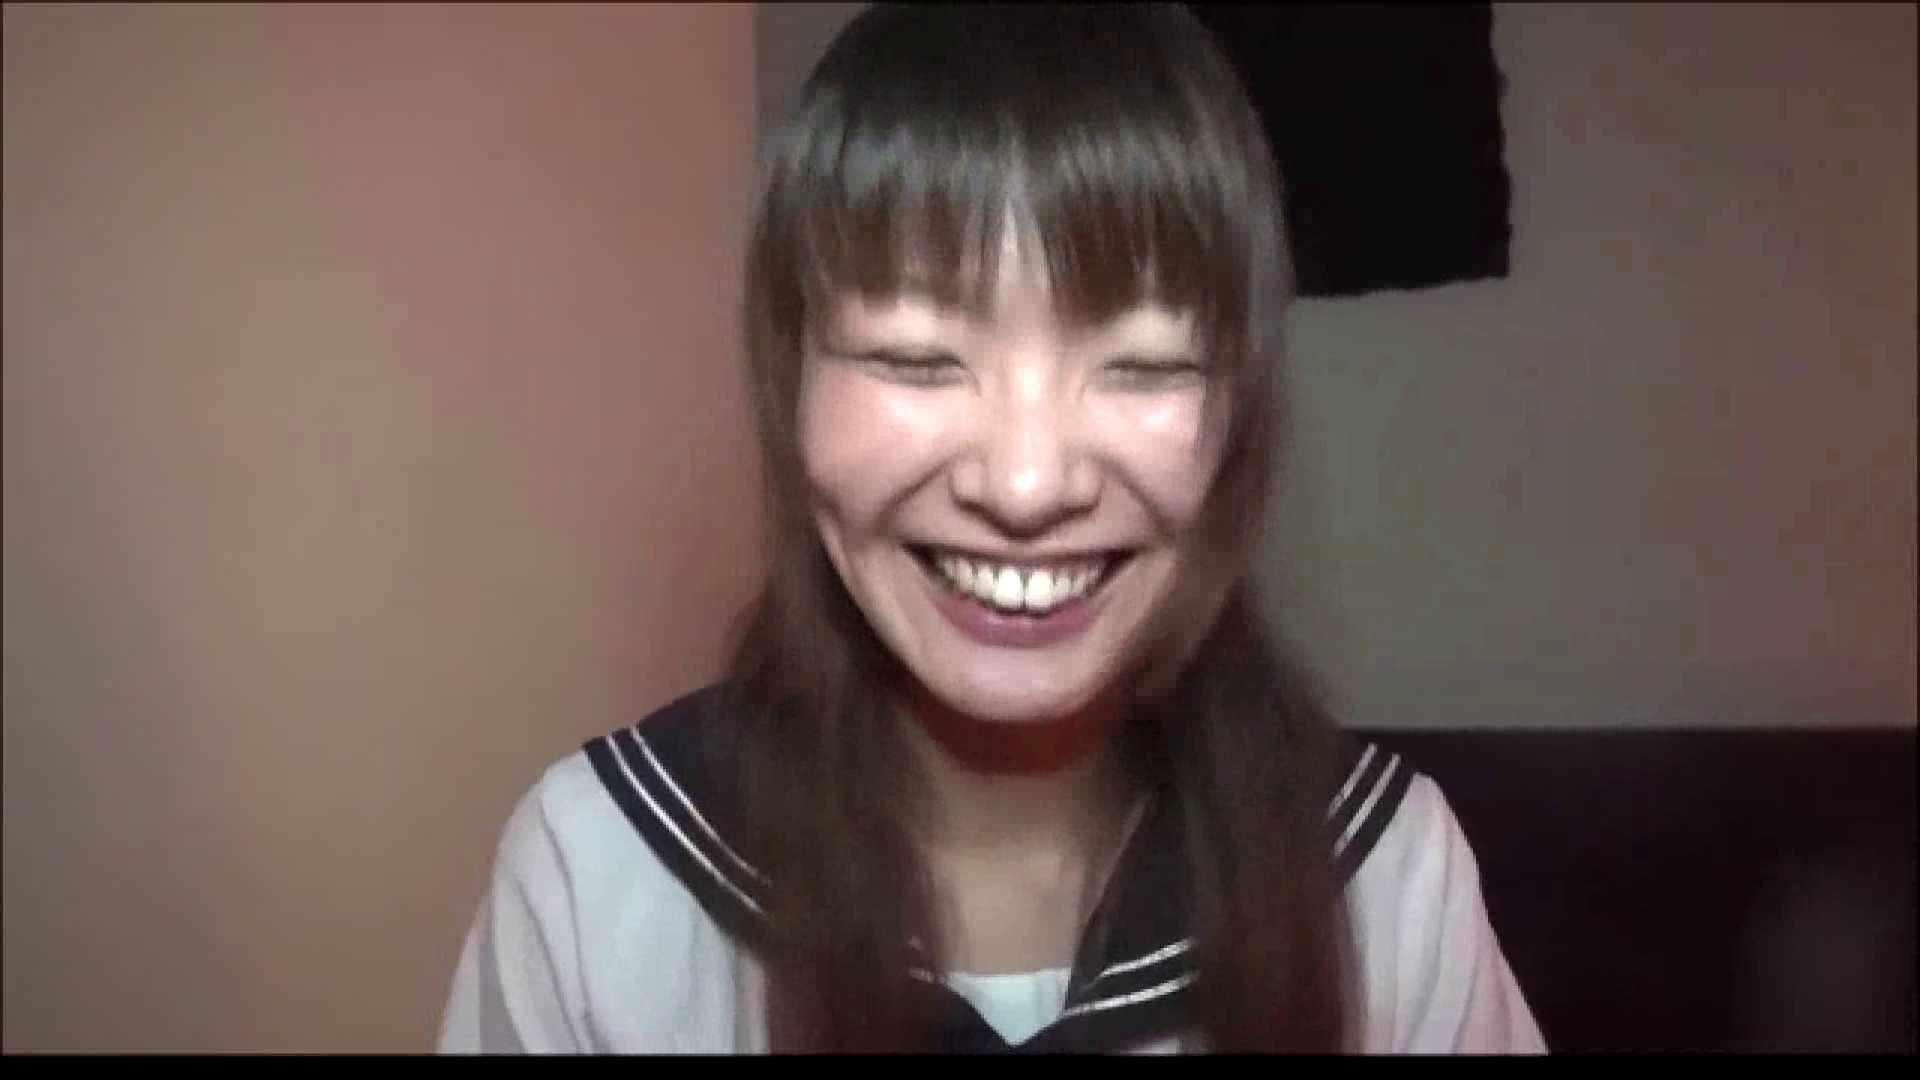 ハメ撮り天国 Vol.28 流出作品  44連発 14